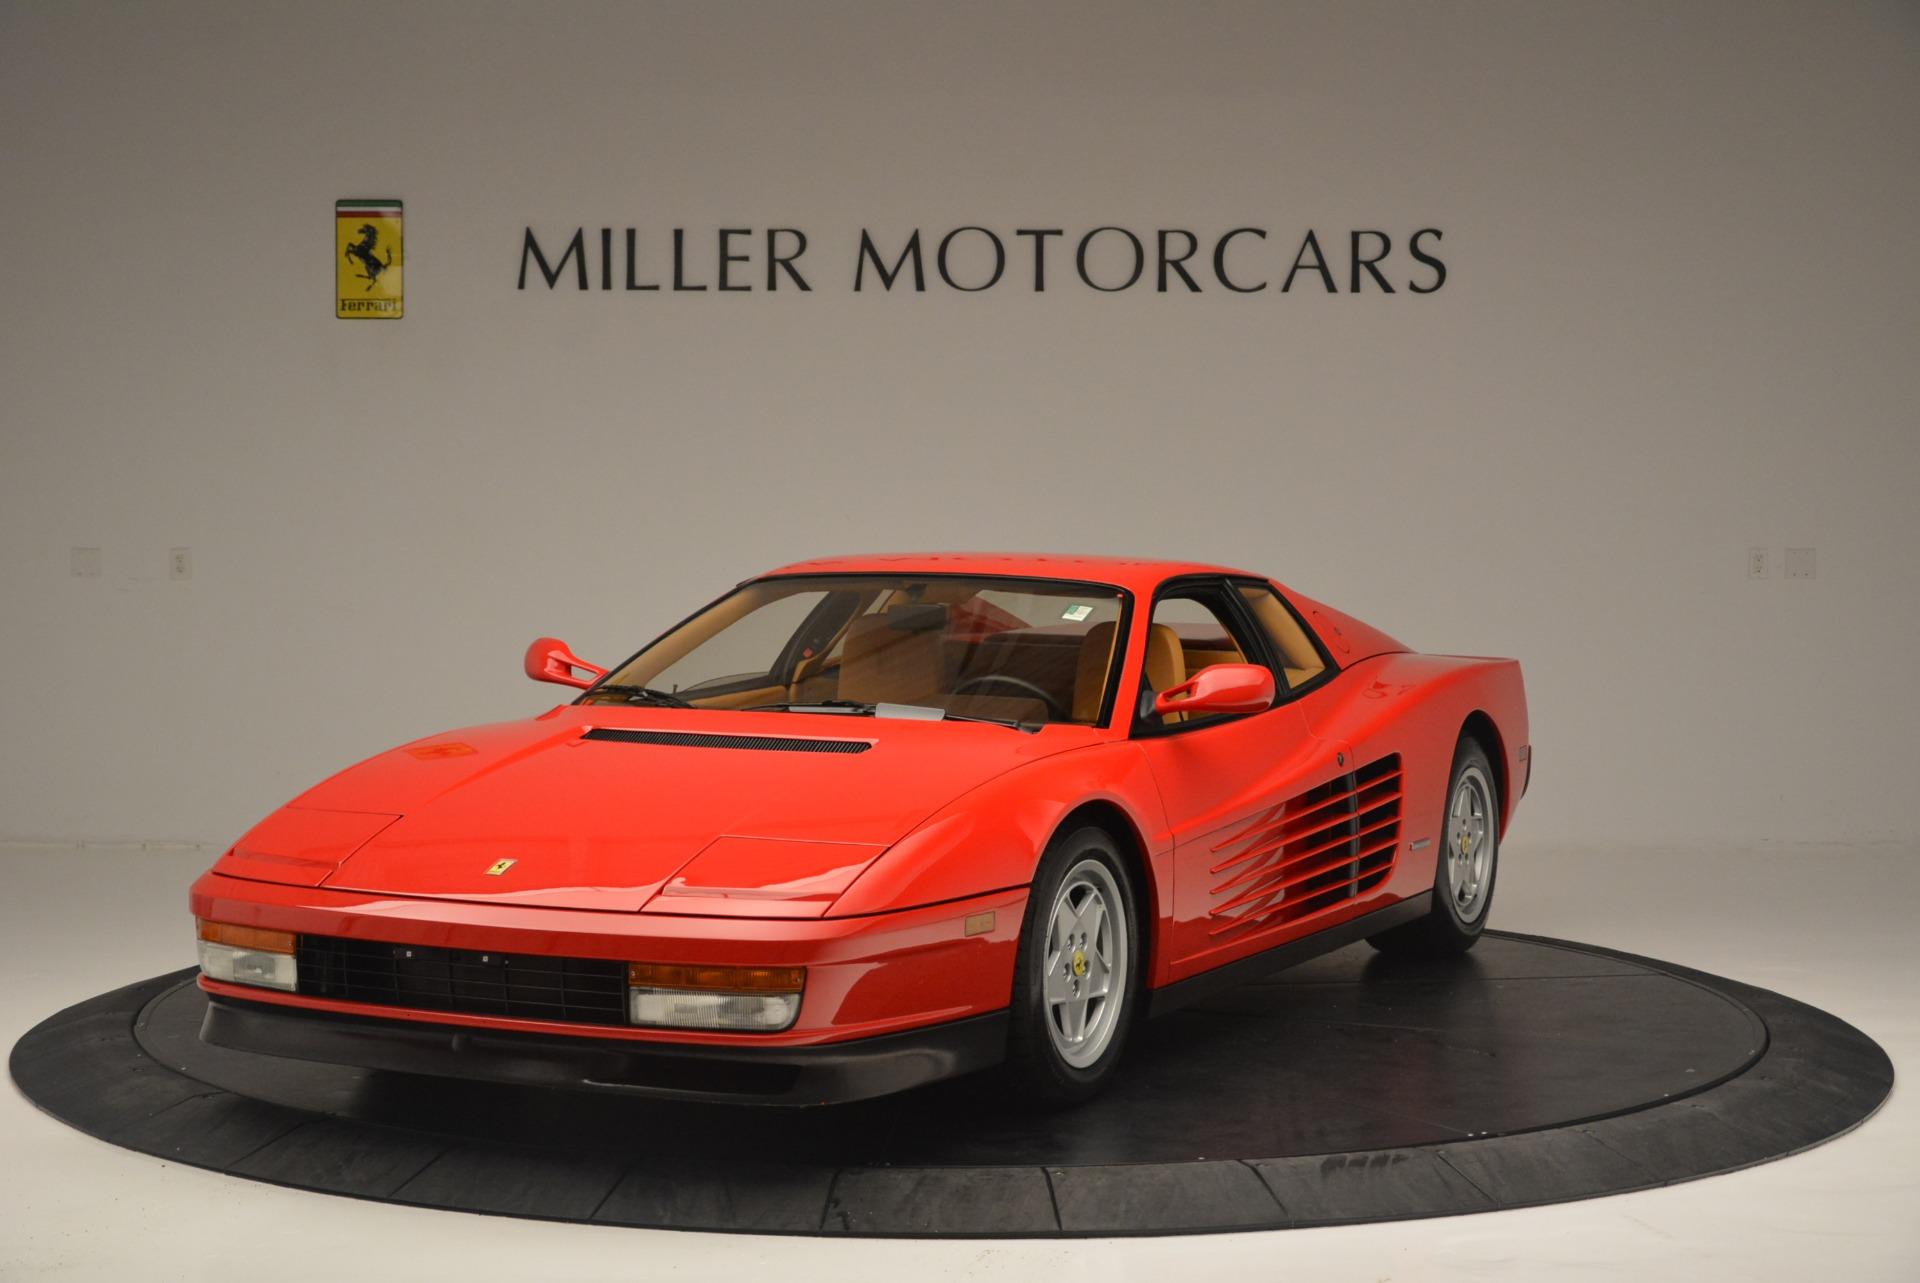 Used 1990 Ferrari Testarossa for sale Sold at Bentley Greenwich in Greenwich CT 06830 1